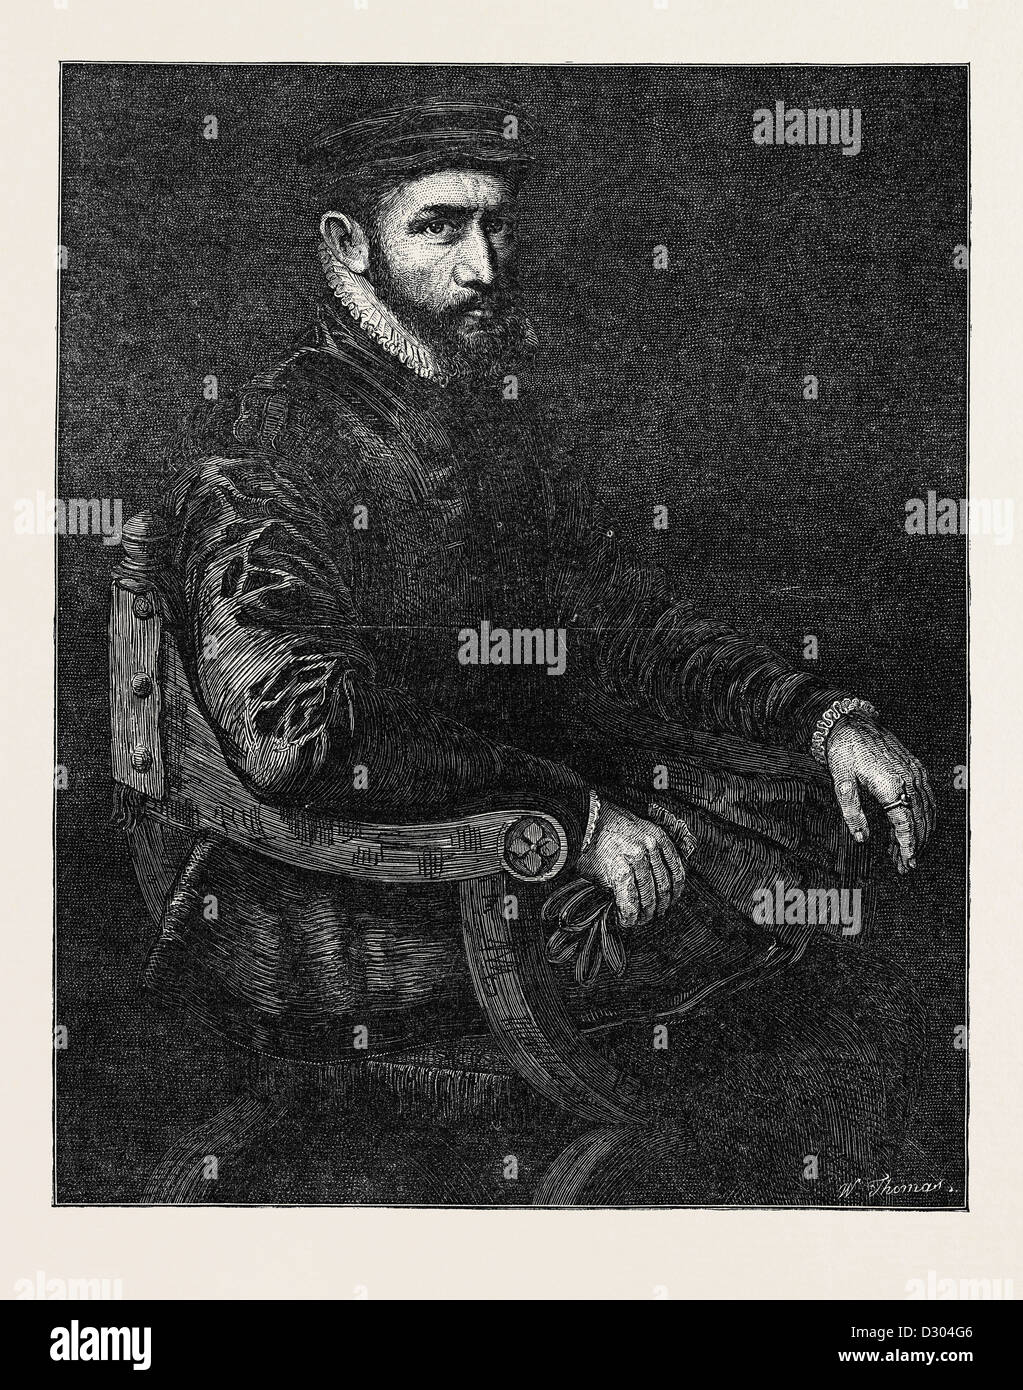 SIR THOMAS GRESHAM BY SIR ANTONIO MORE IN THE NATIONAL PORTRAIT EXHIBITION SOUTH KENSINGTON LONDON UK - Stock Image